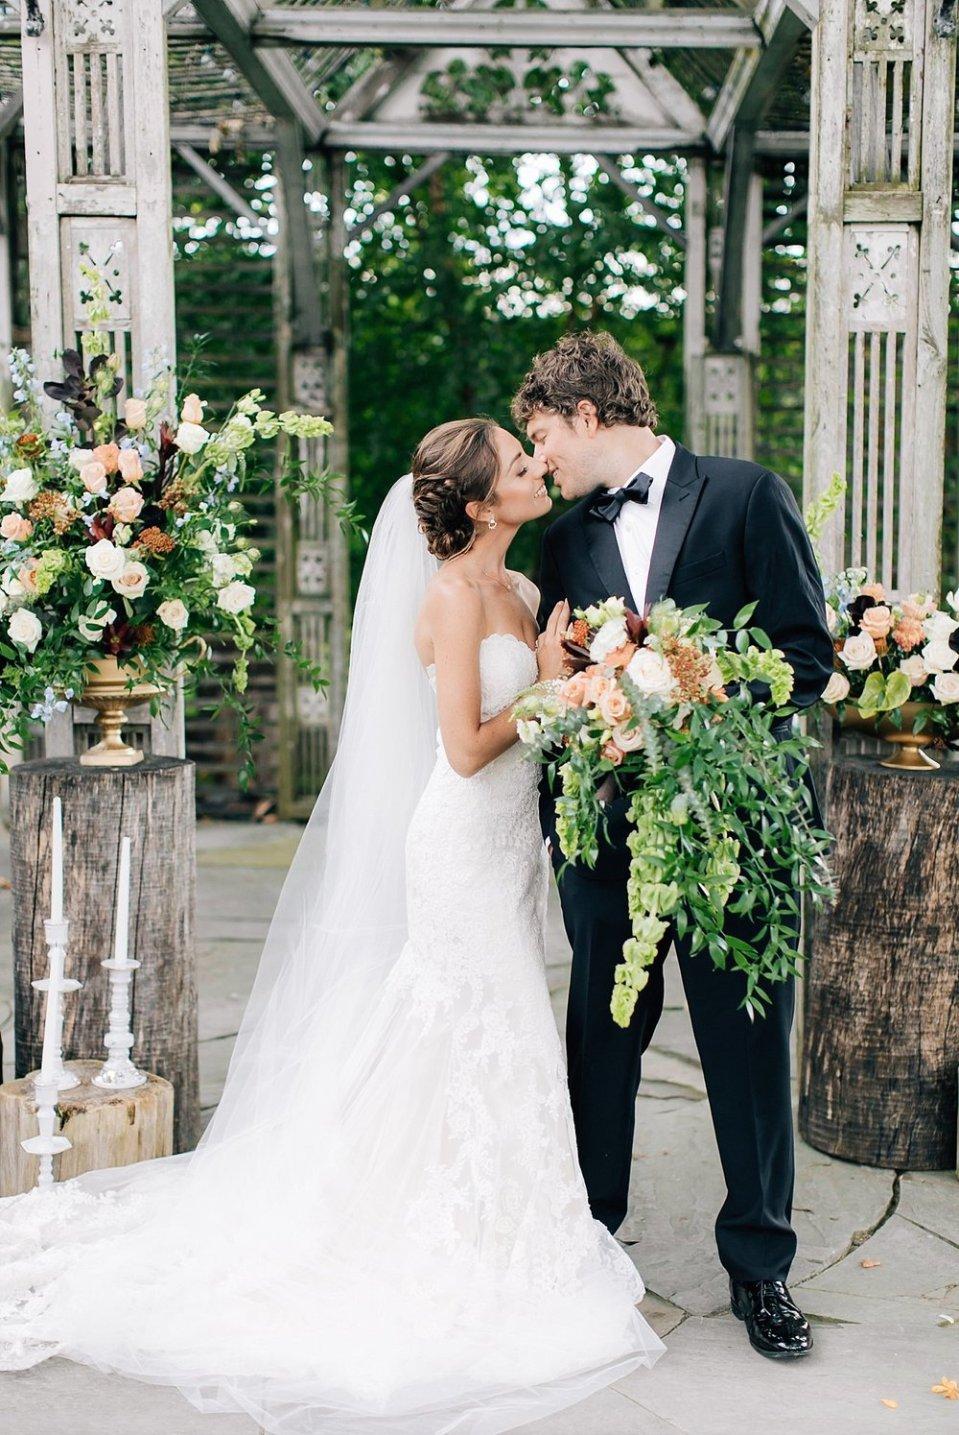 terrain gatherings glen mills pa romantic garden wedding photography magdalena studios 0044